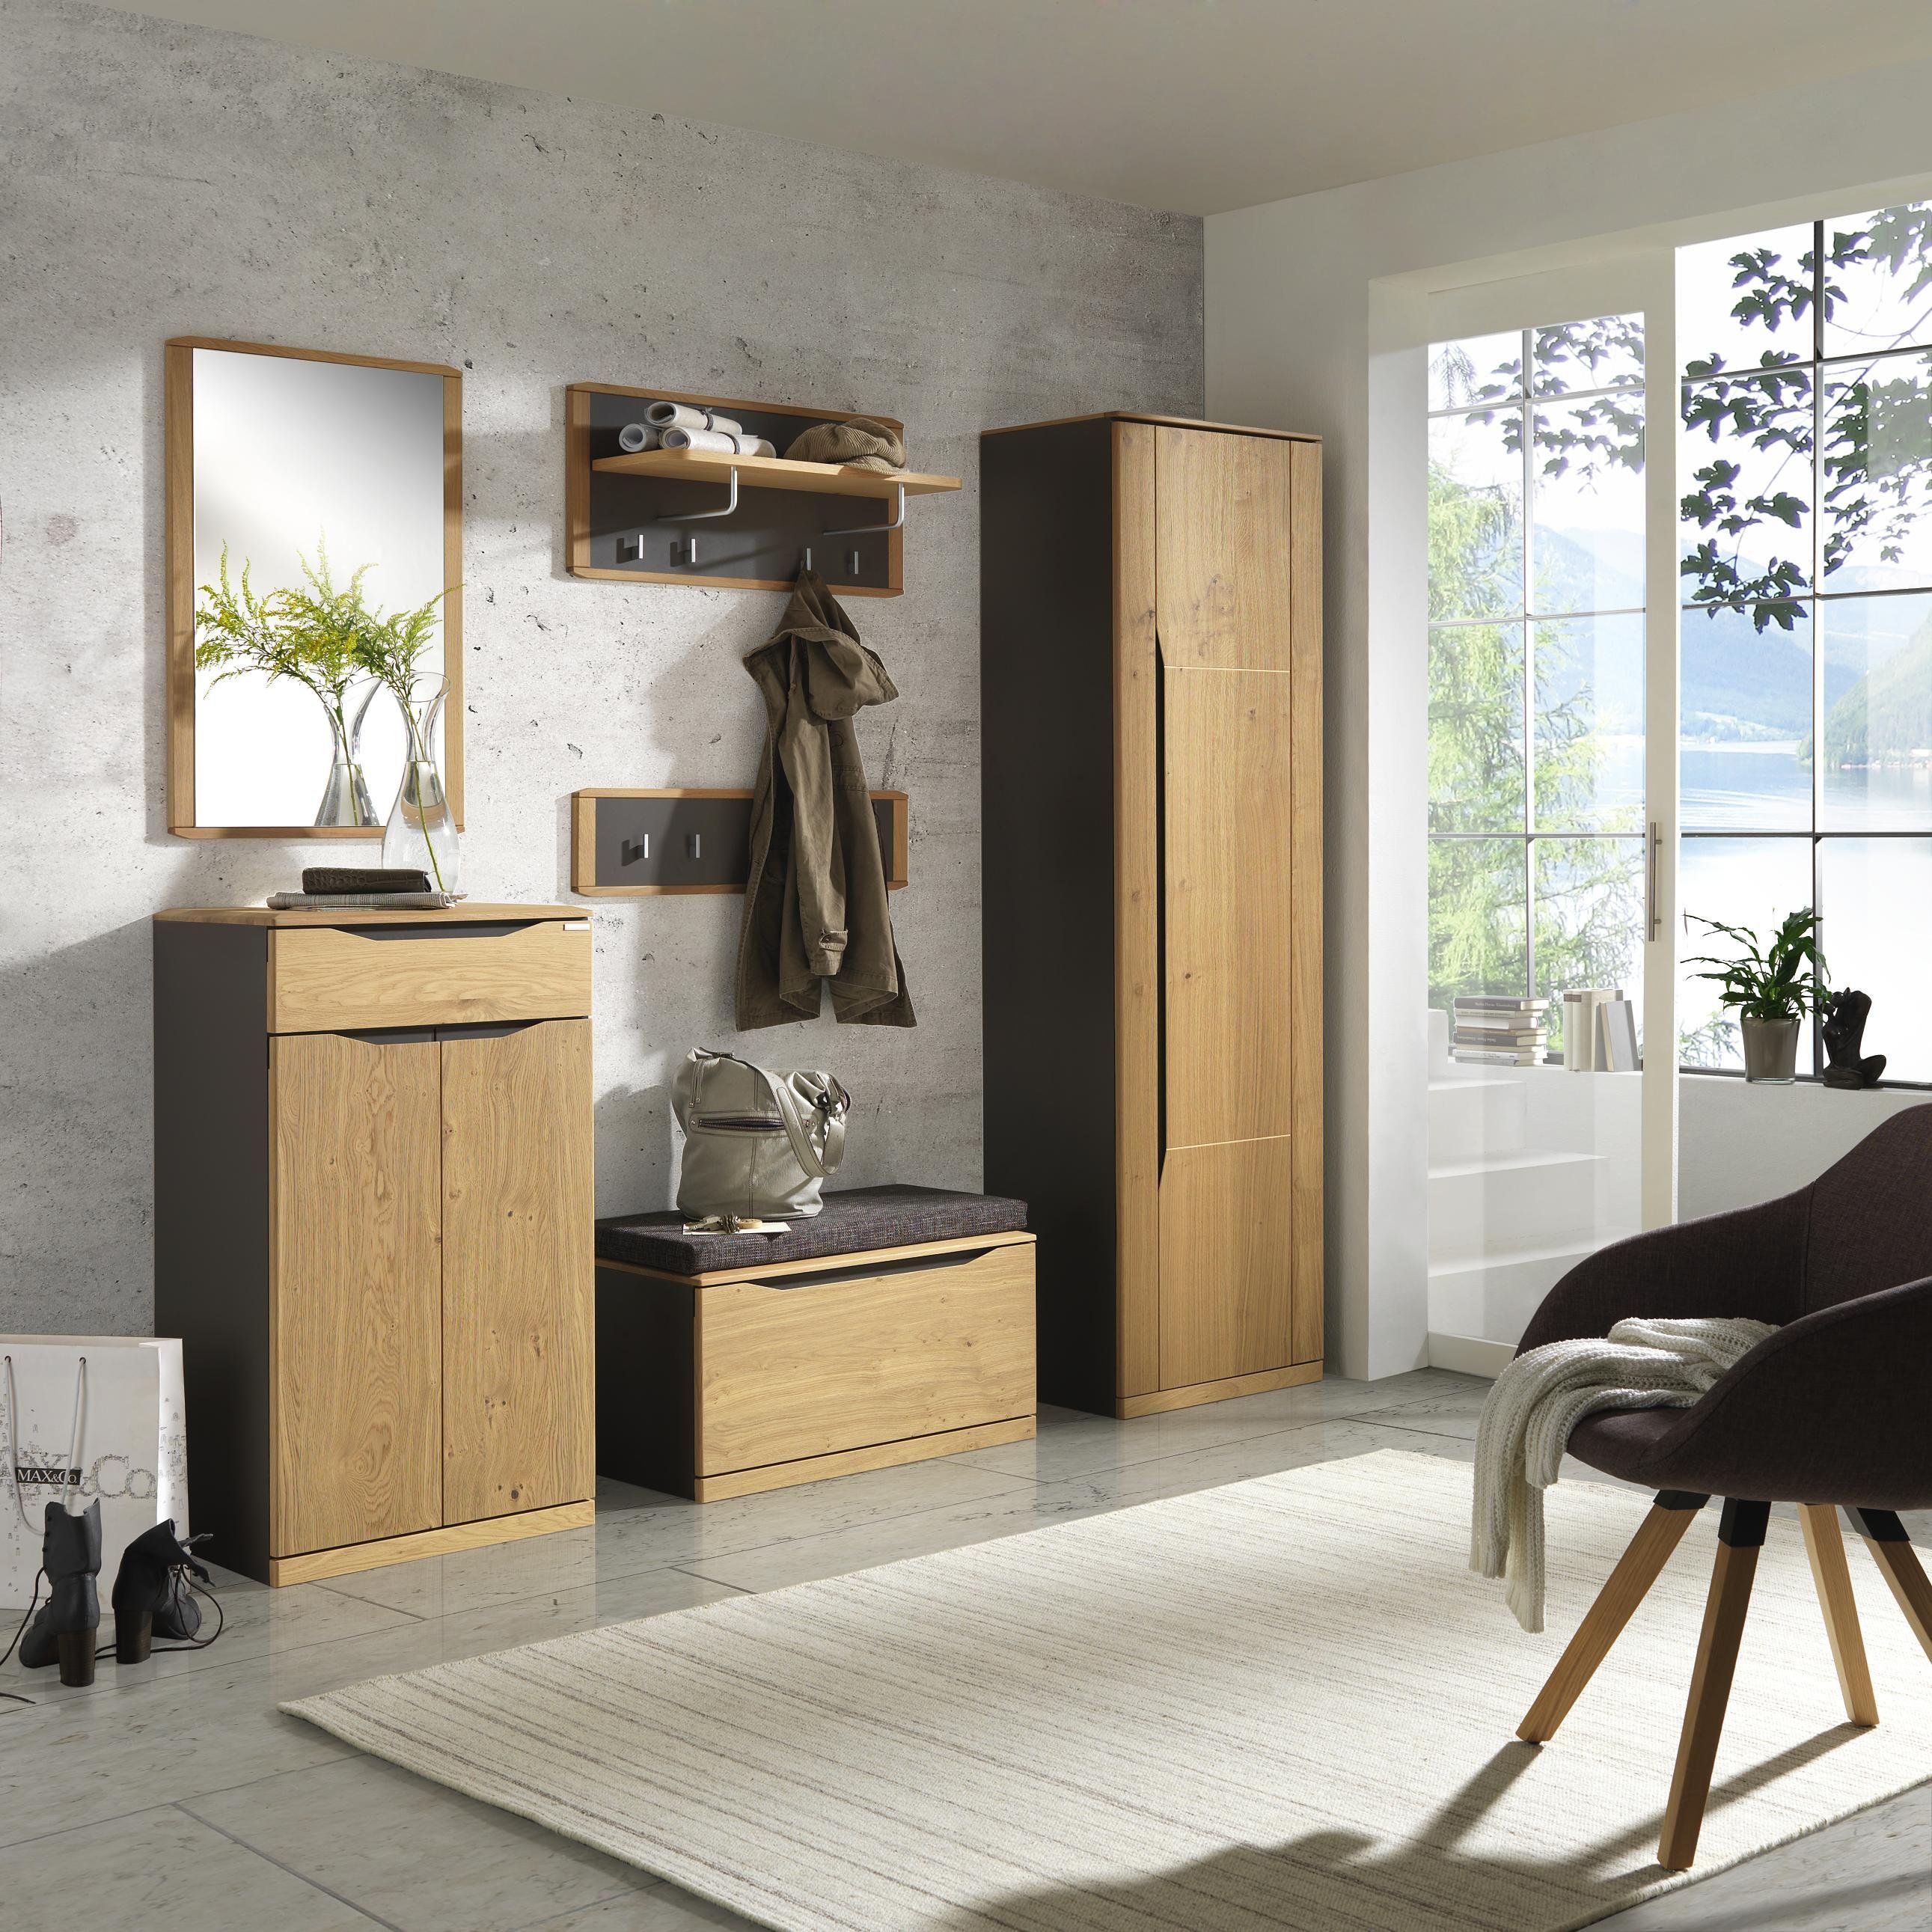 Garderobe von venda gaderobe in 2019 - Linea natura garderobe ...